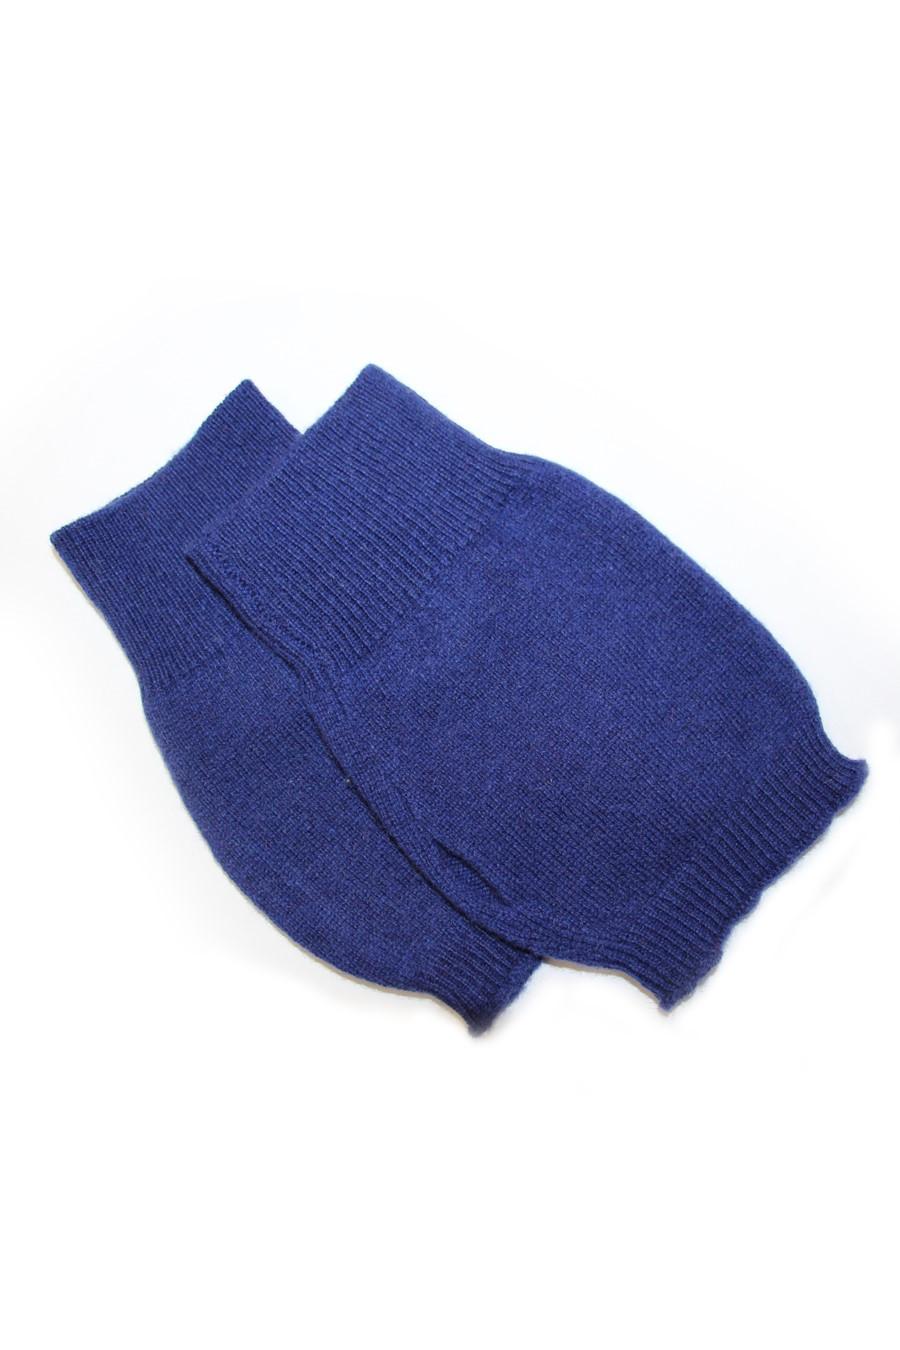 mitaines 100% cachemire bleu marine